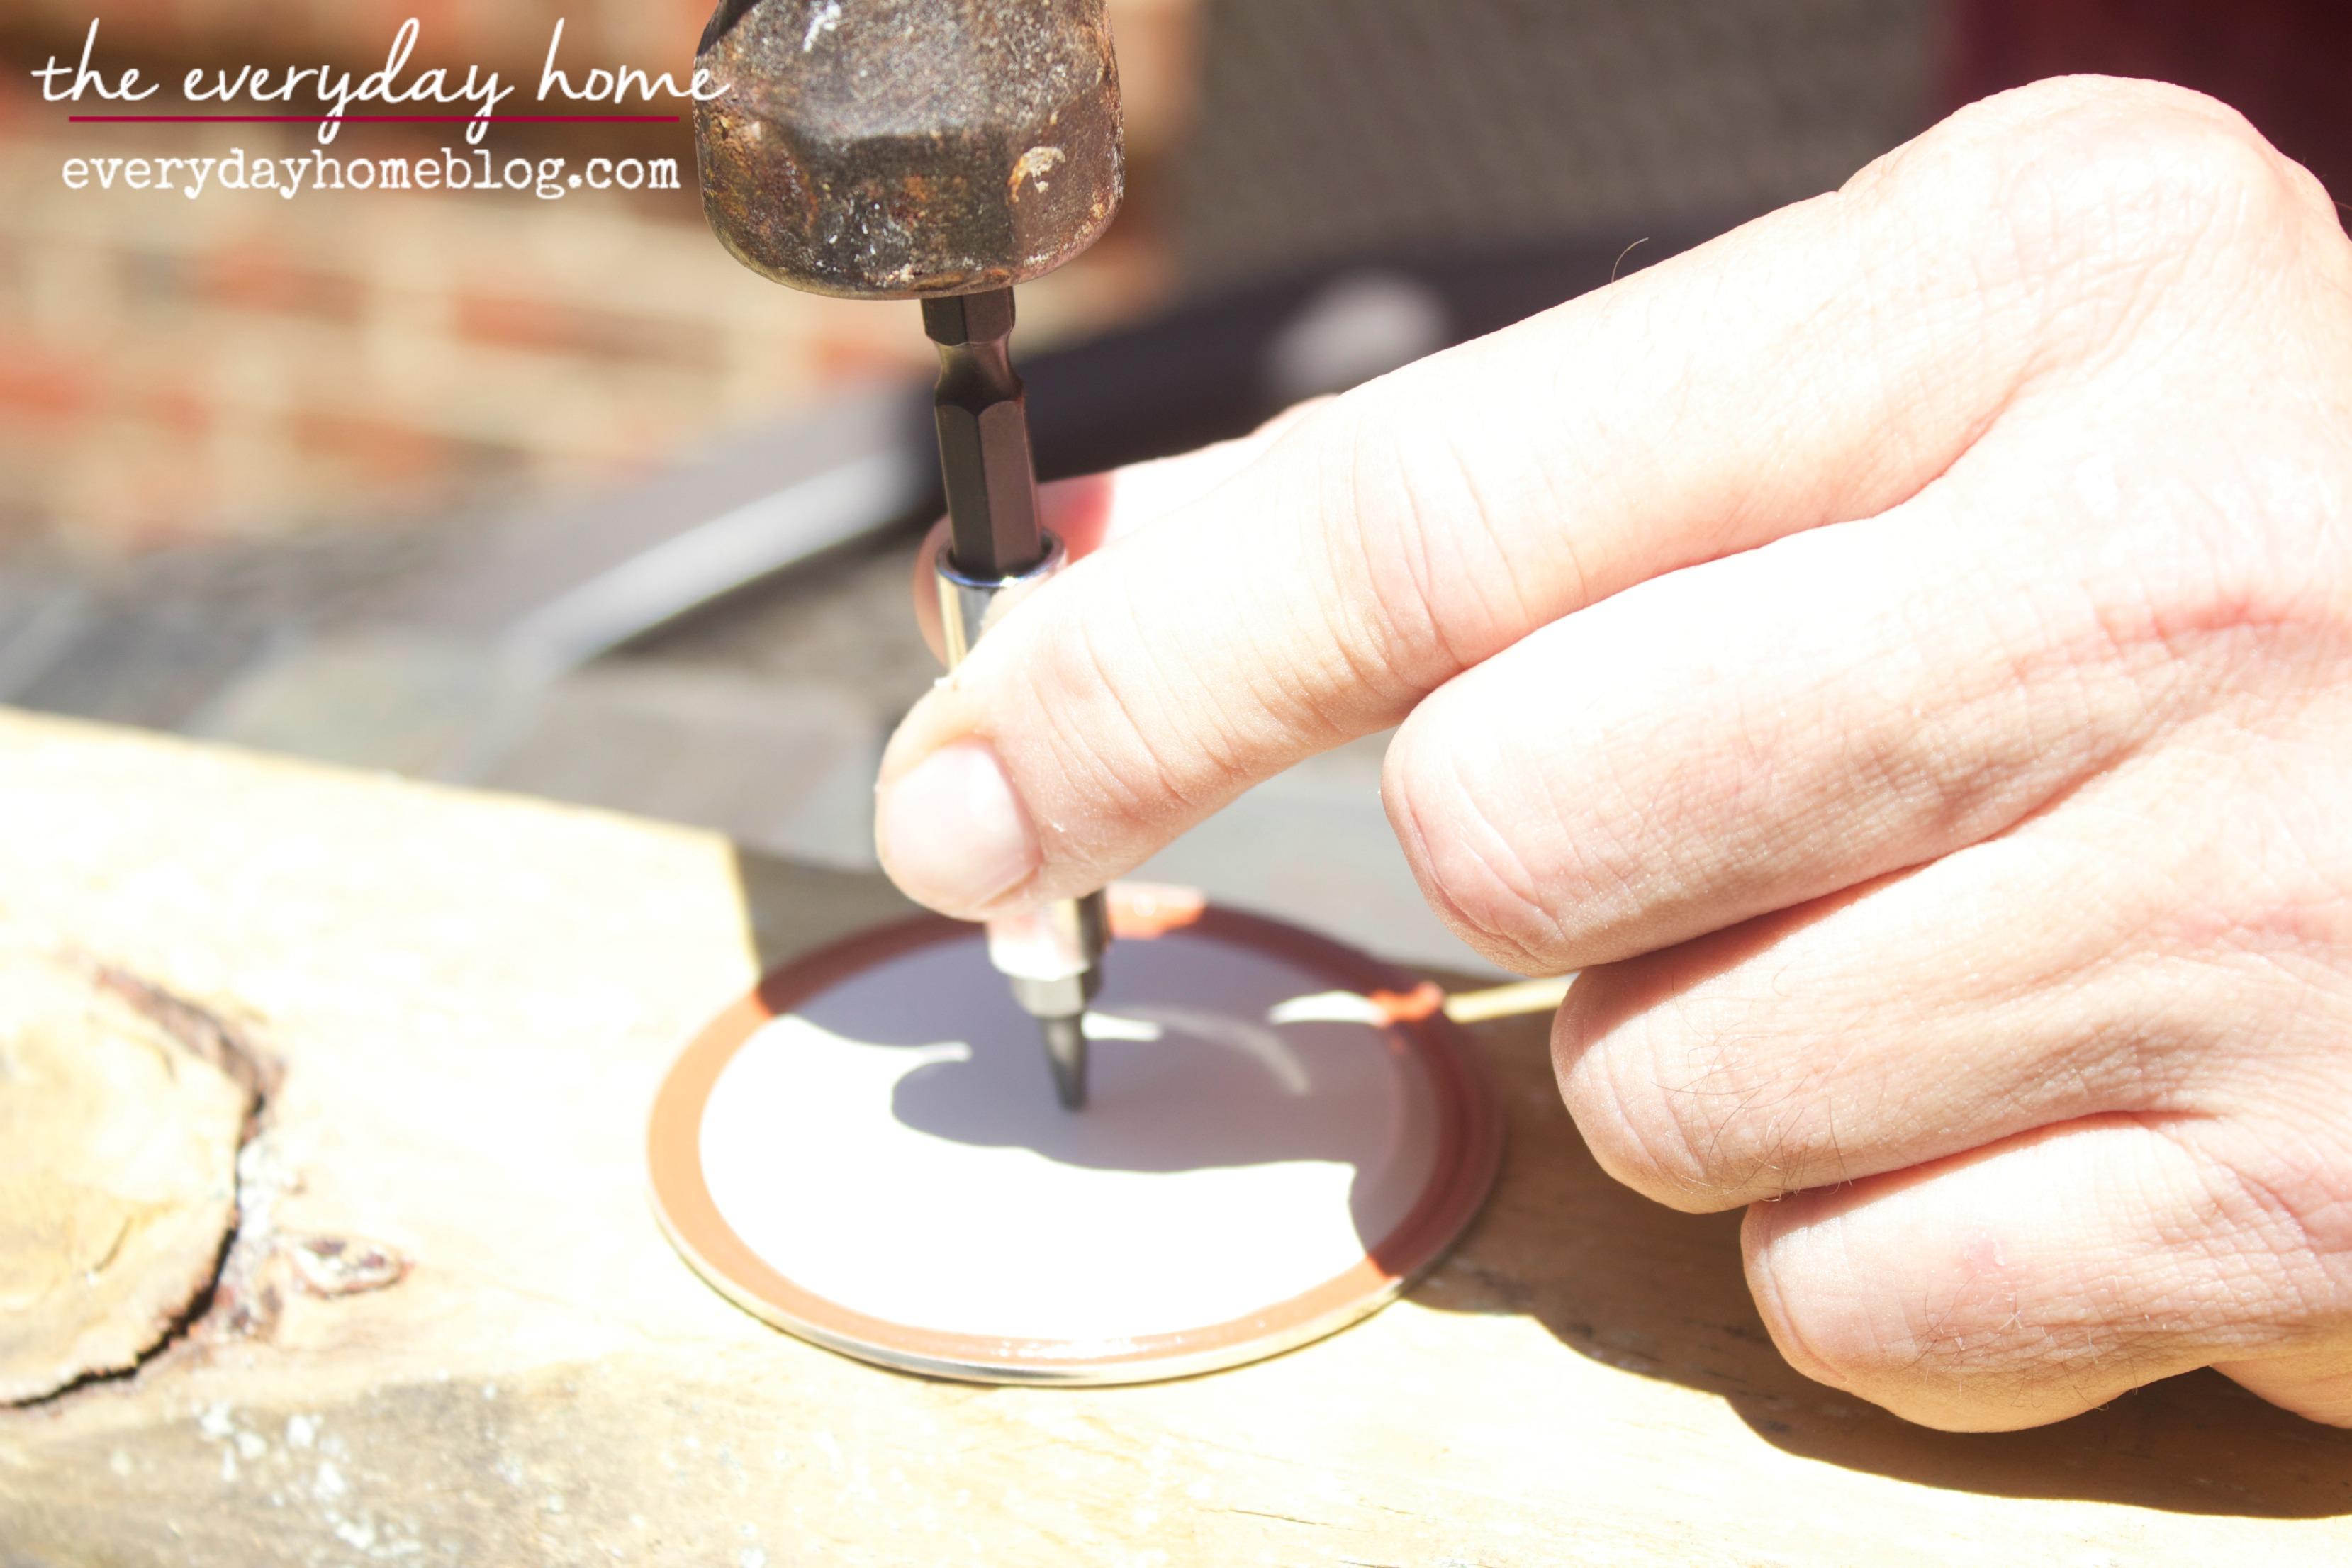 DIY Citronella Mason Jar Candles The Everyday Home Blog www.everydayhomeblog.com (3)